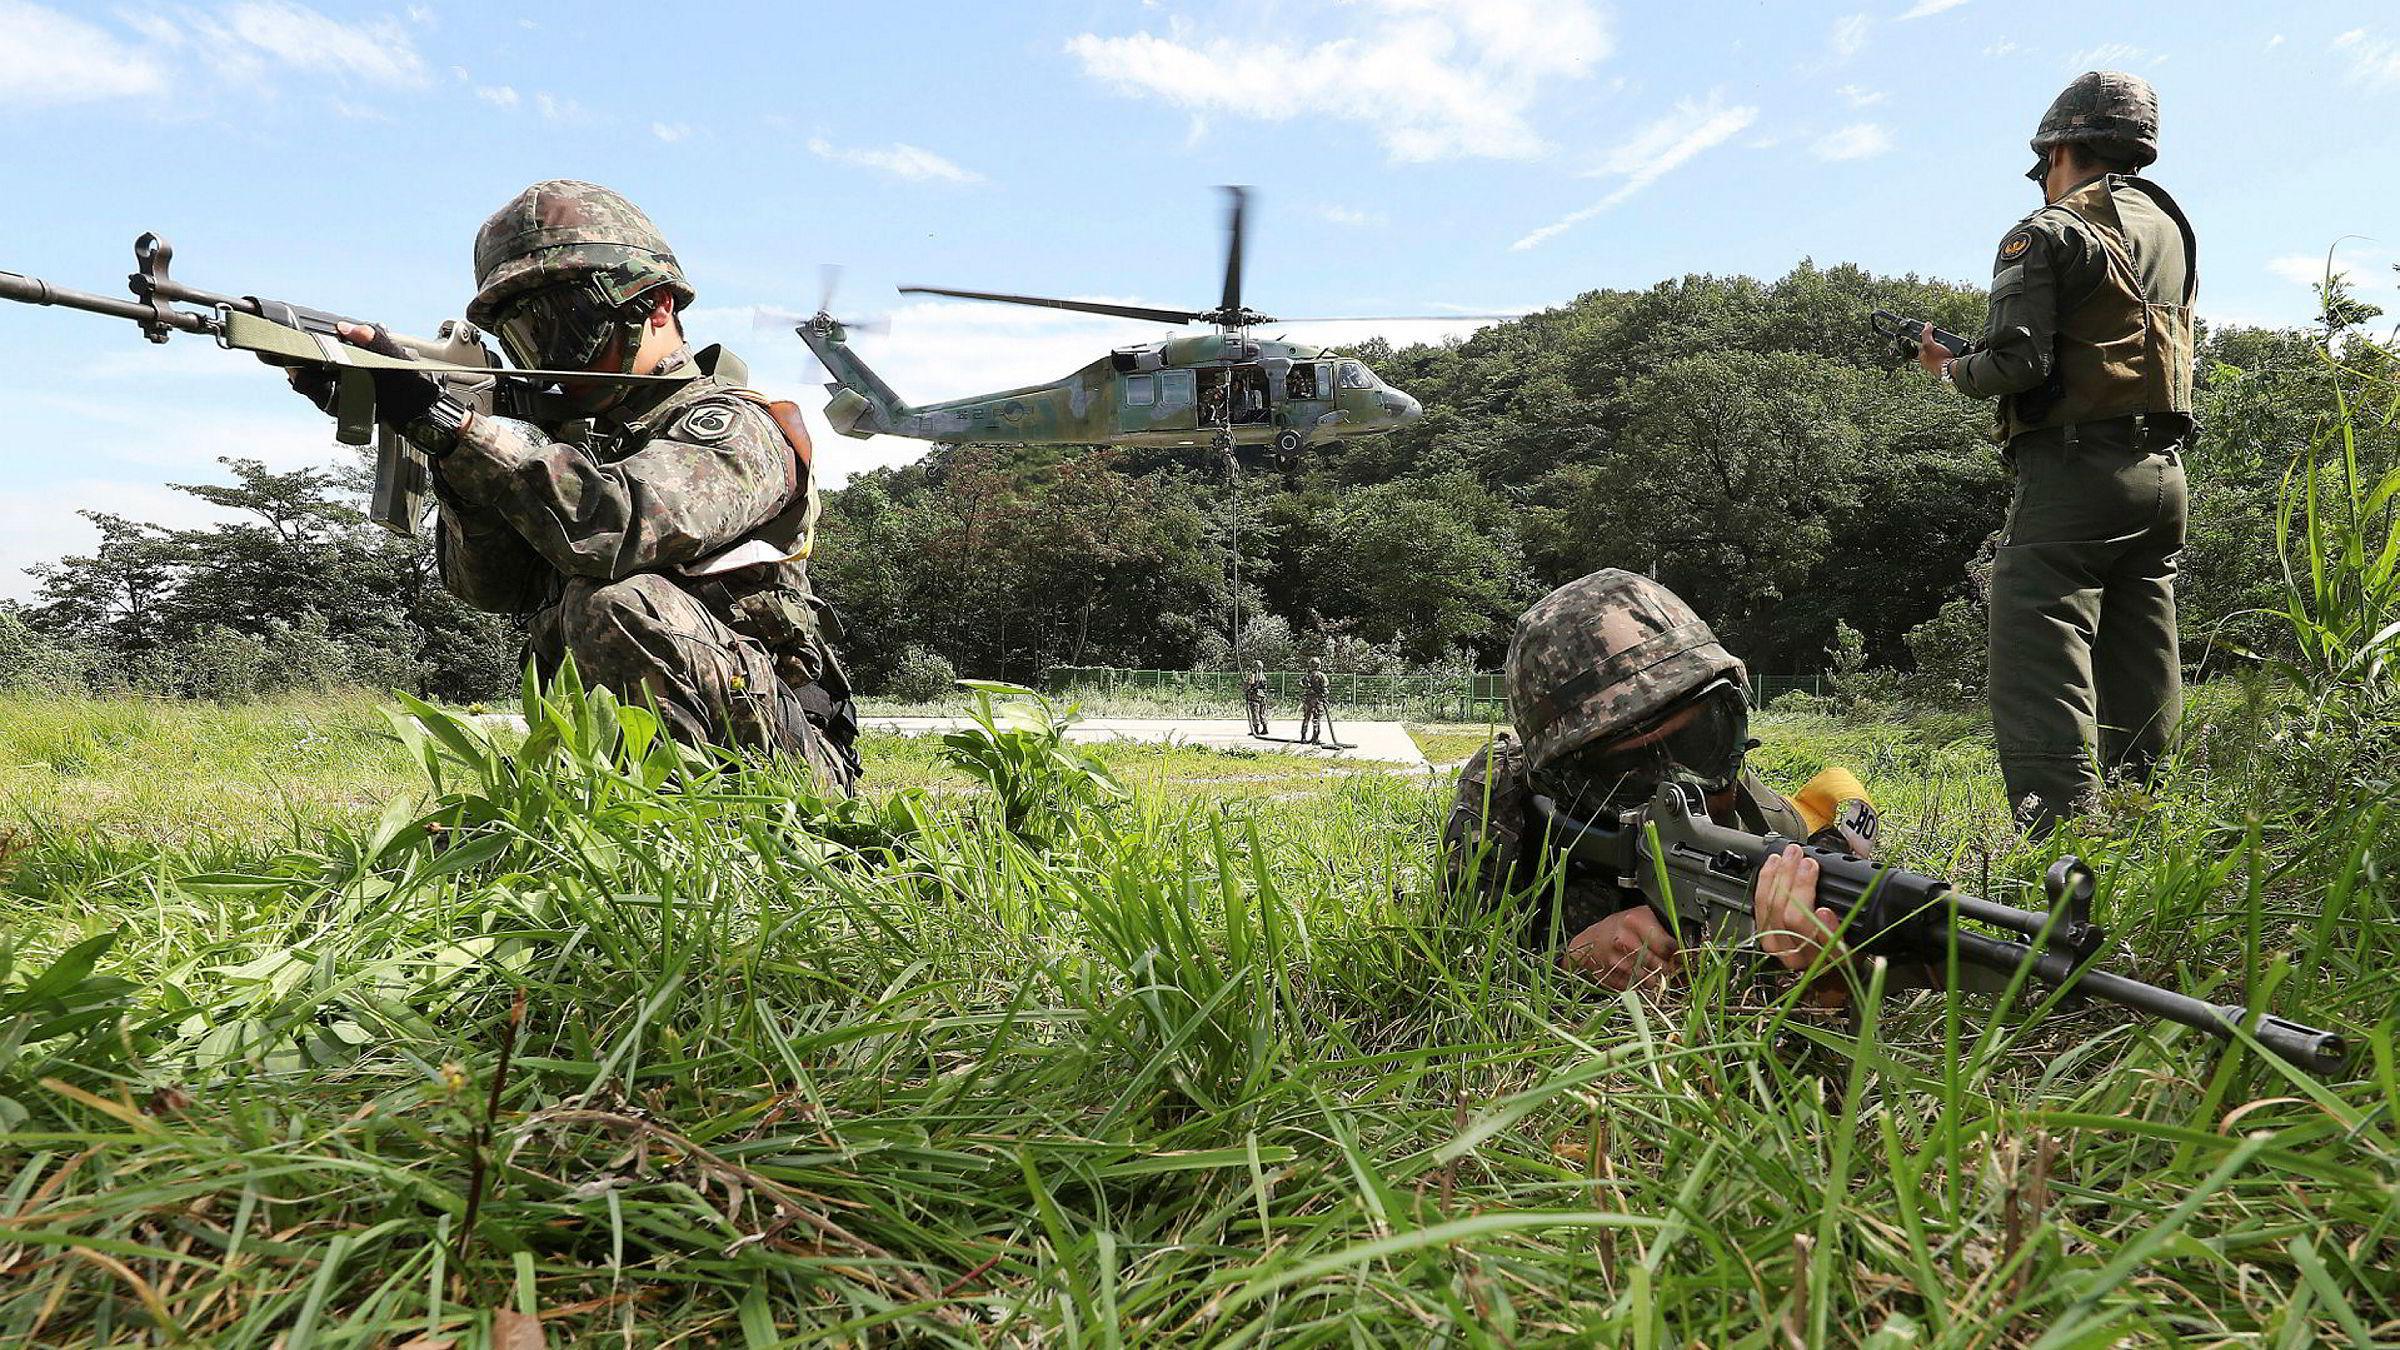 Spenningen over Korea-halvøya har økt etter tirsdagens missileavfyring fra Nord-Korea over japansk territorium. På bildet ser vi sørkoreanske soldater som trener på under en årlig øvelse i Yongin. Hong Gi-won/Yonhap via AP)